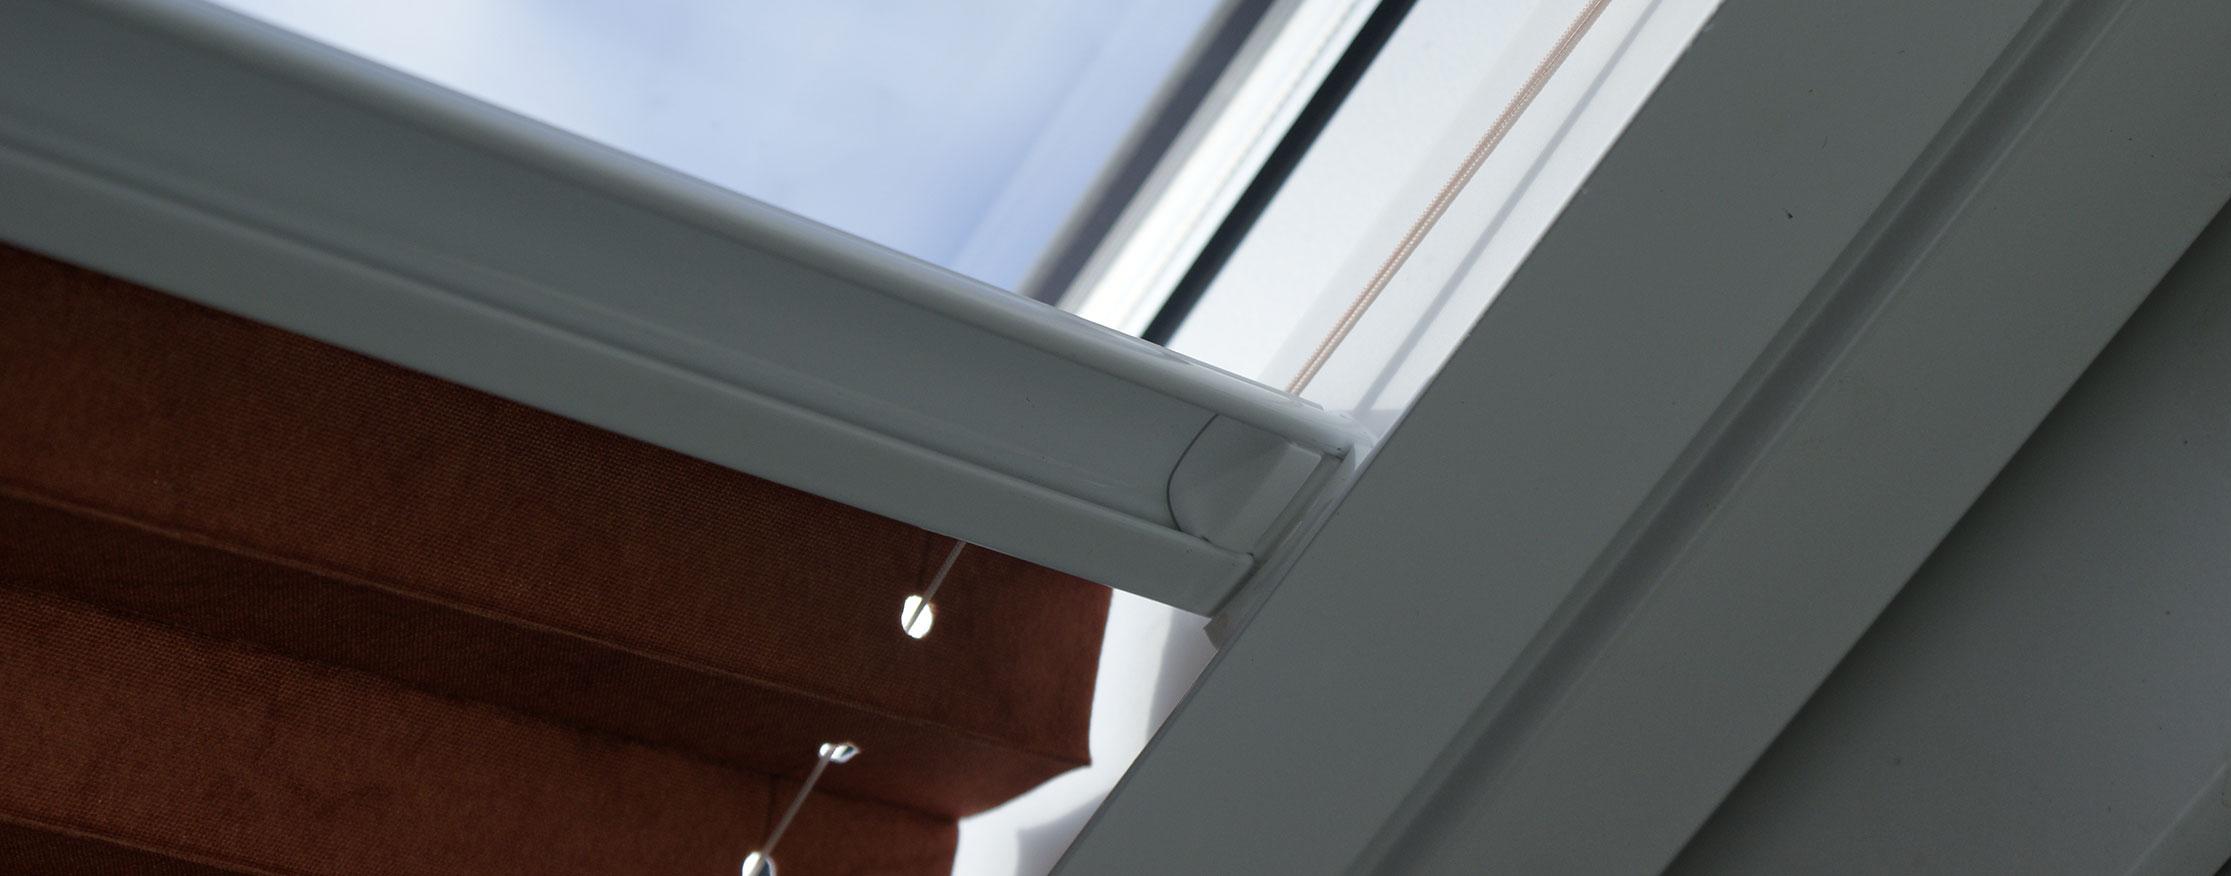 dachfenster plissee finest dachfenster rollo with dachfenster plissee fabulous dachfenster. Black Bedroom Furniture Sets. Home Design Ideas